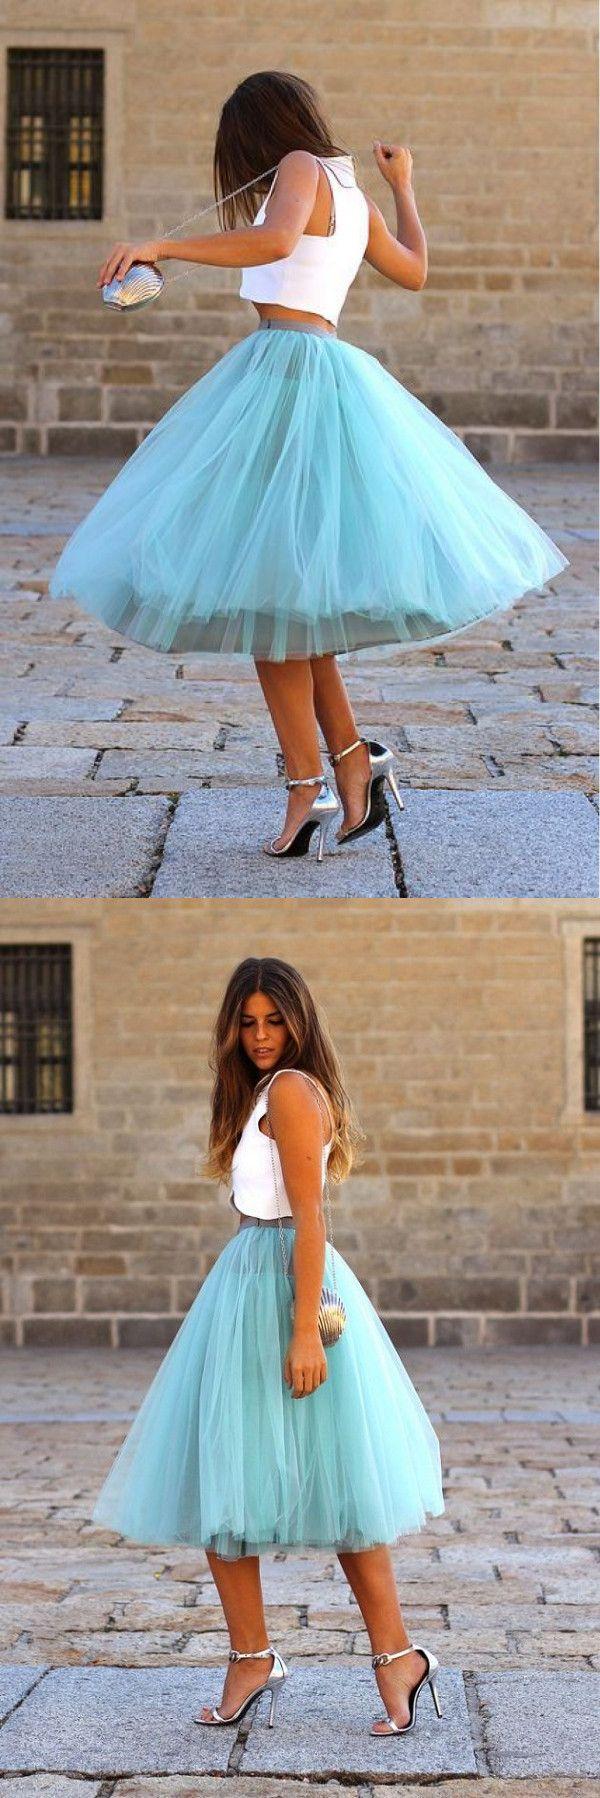 blue tutu skirt, short bridesmaid dress, blue bridesmaid dress, 2017 bridesmaid dress